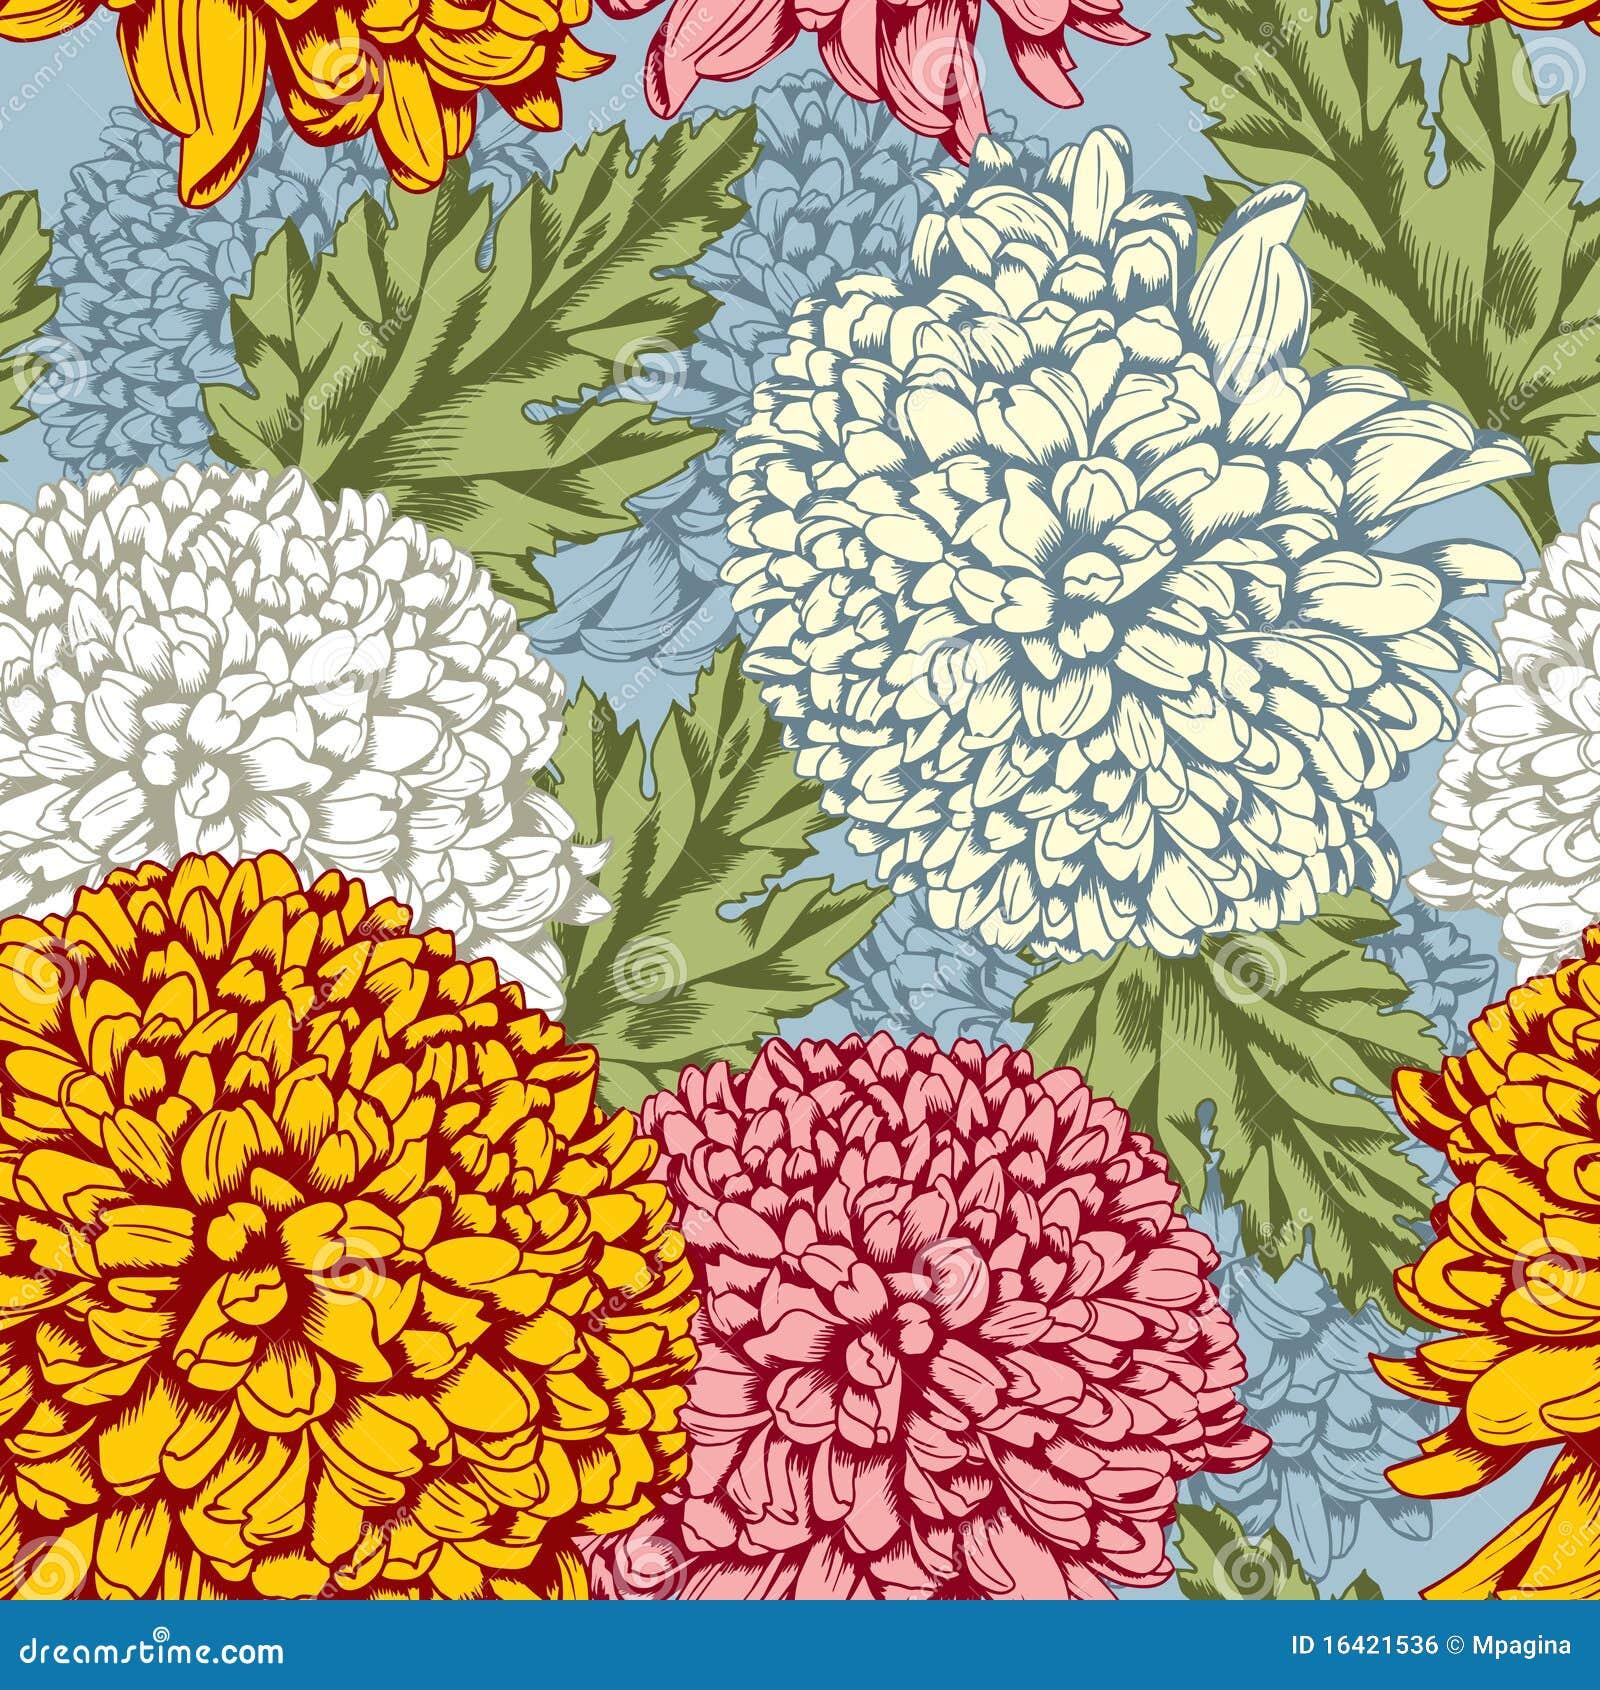 Chrysanthemum Stock Illustrations – 4,798 Chrysanthemum Stock ...